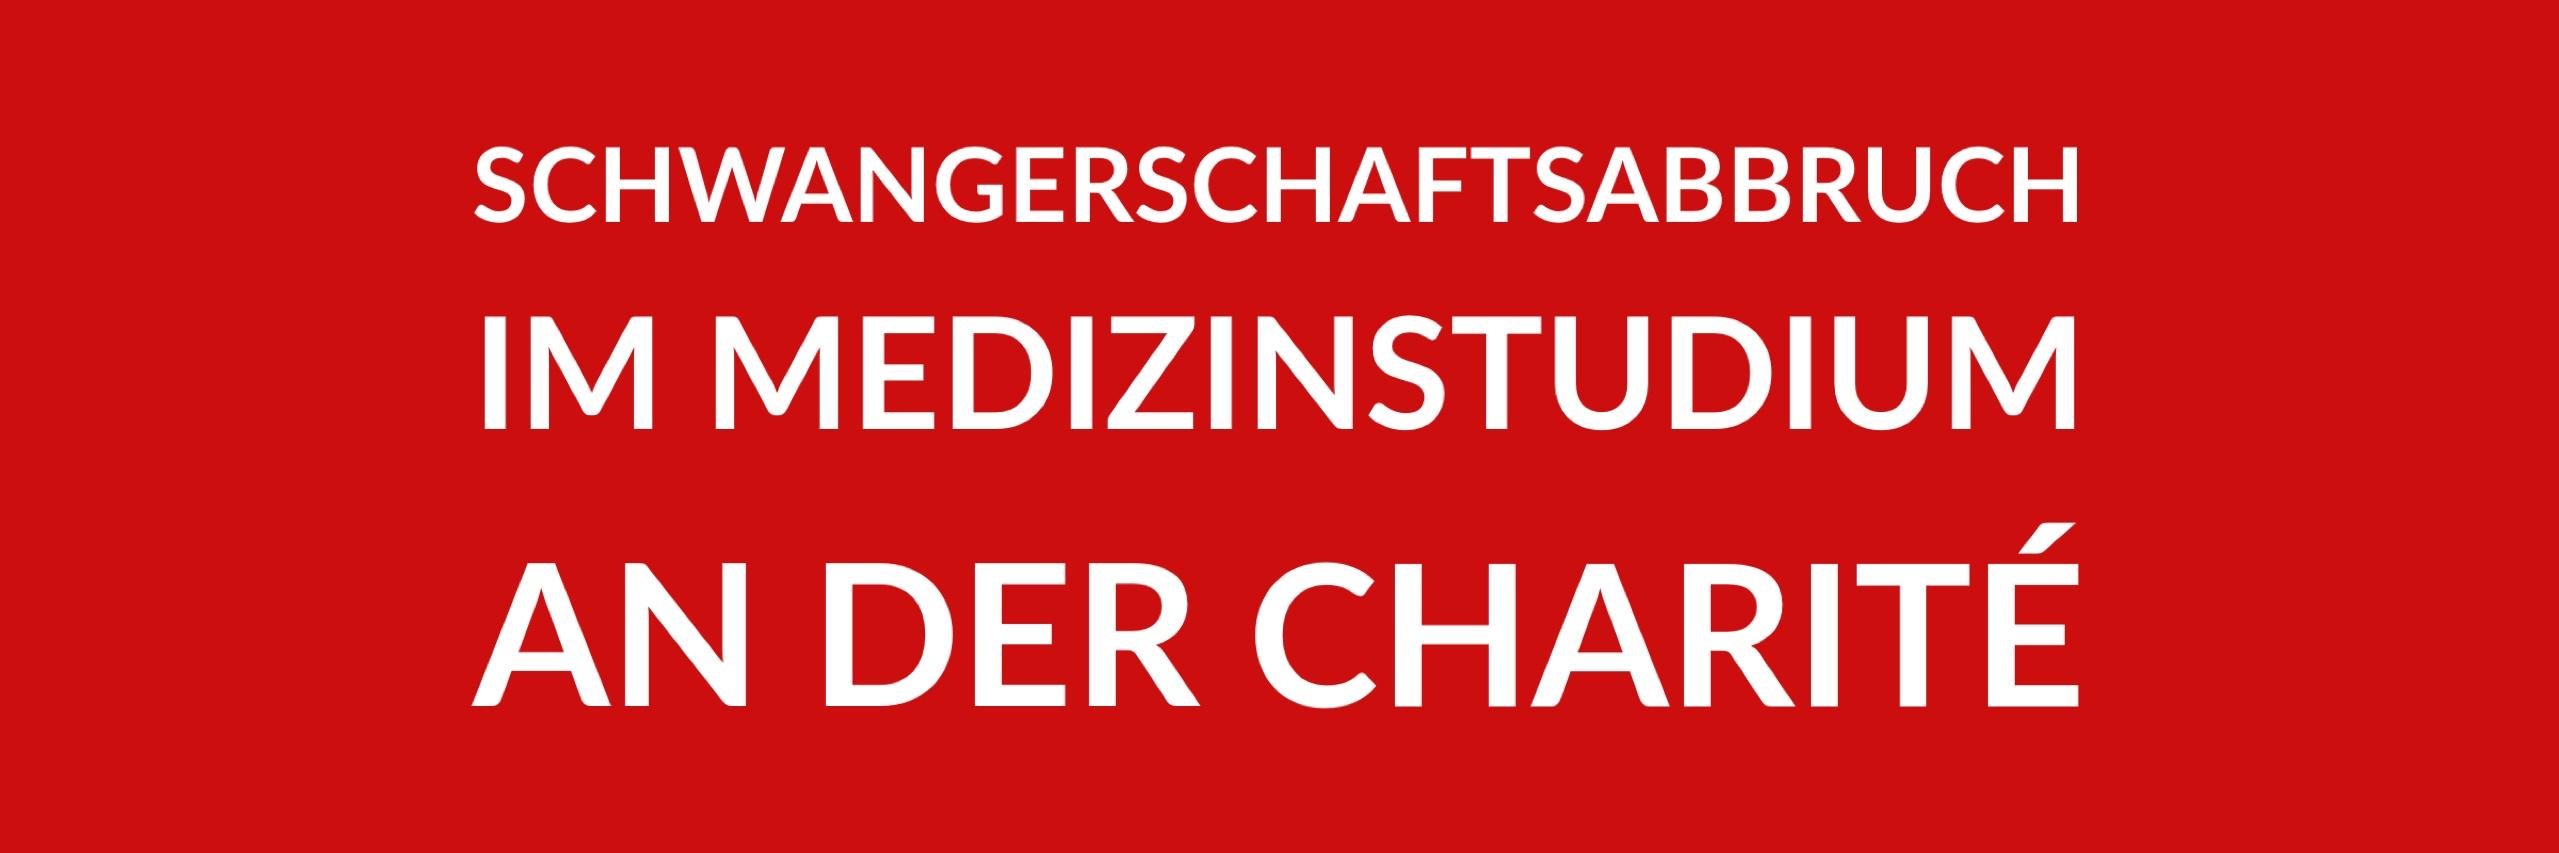 Anfrage 'Schwangerschaftsabbruch im Medizinstudium an der Charité' (PDF)